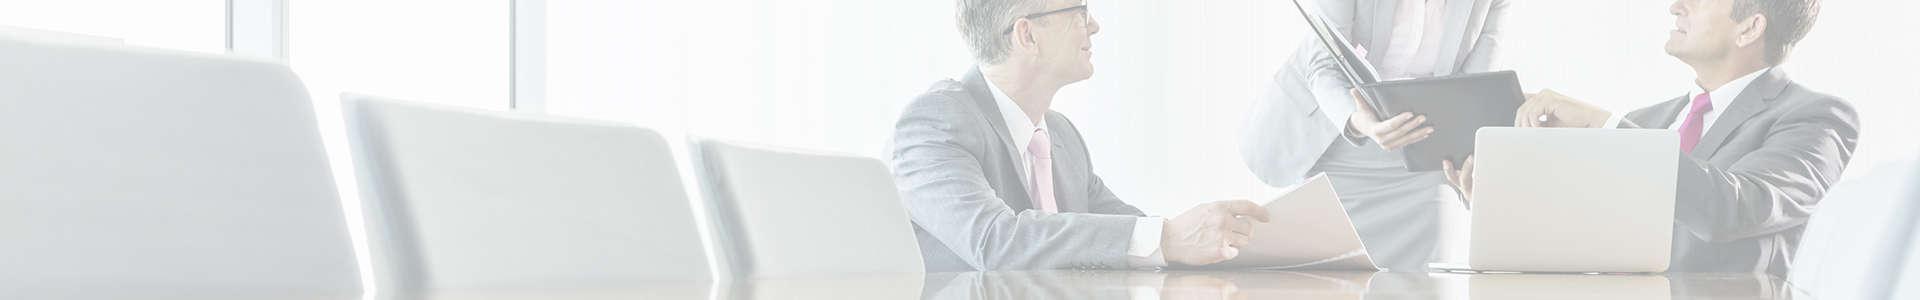 Referral Partner Program Joorney Business Plan